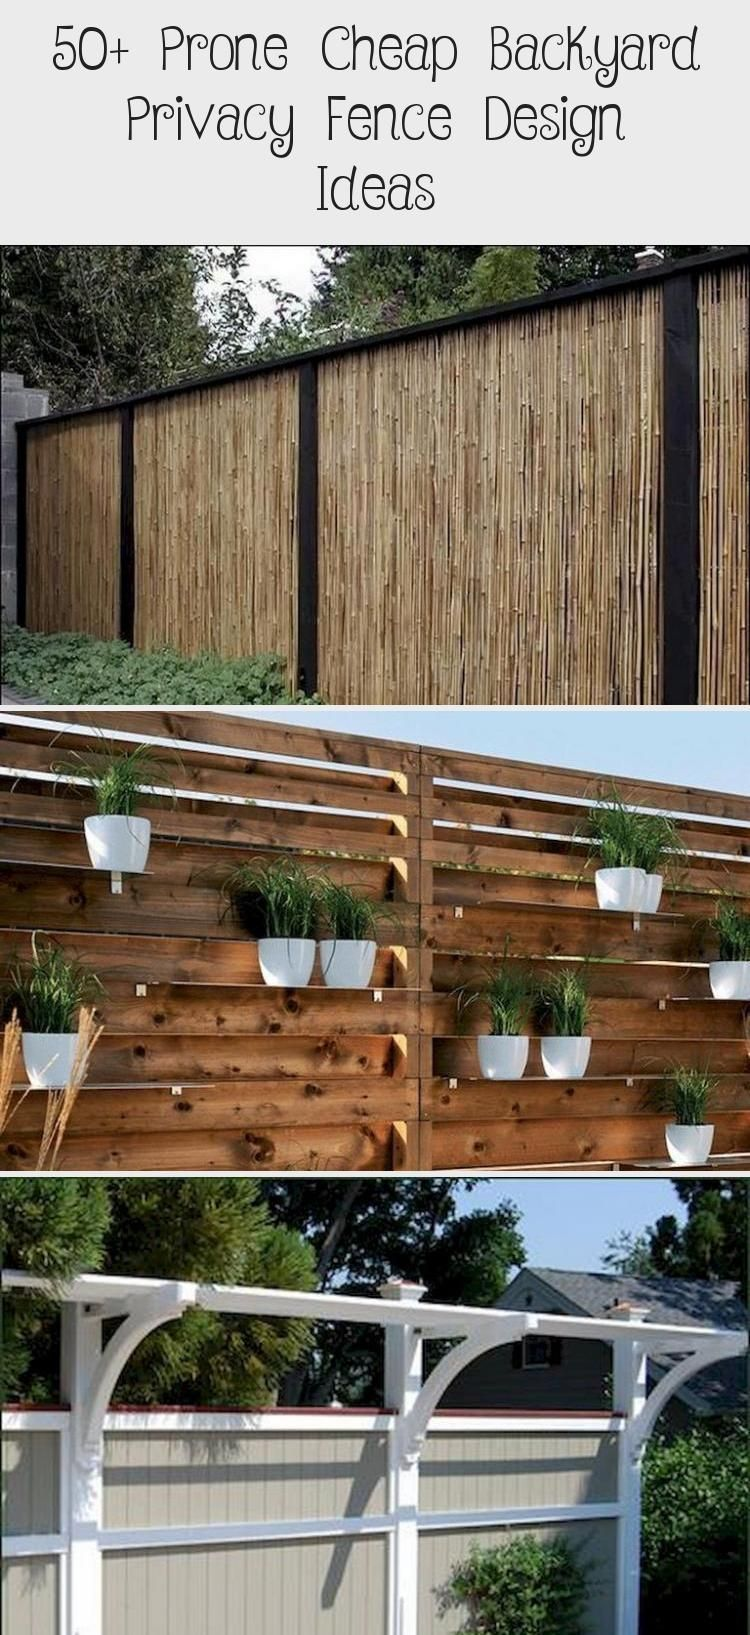 Photo of 50+ Prone Cheap Backyard Privacy Fence Design Ideas #yard #backyard #backyarddes…